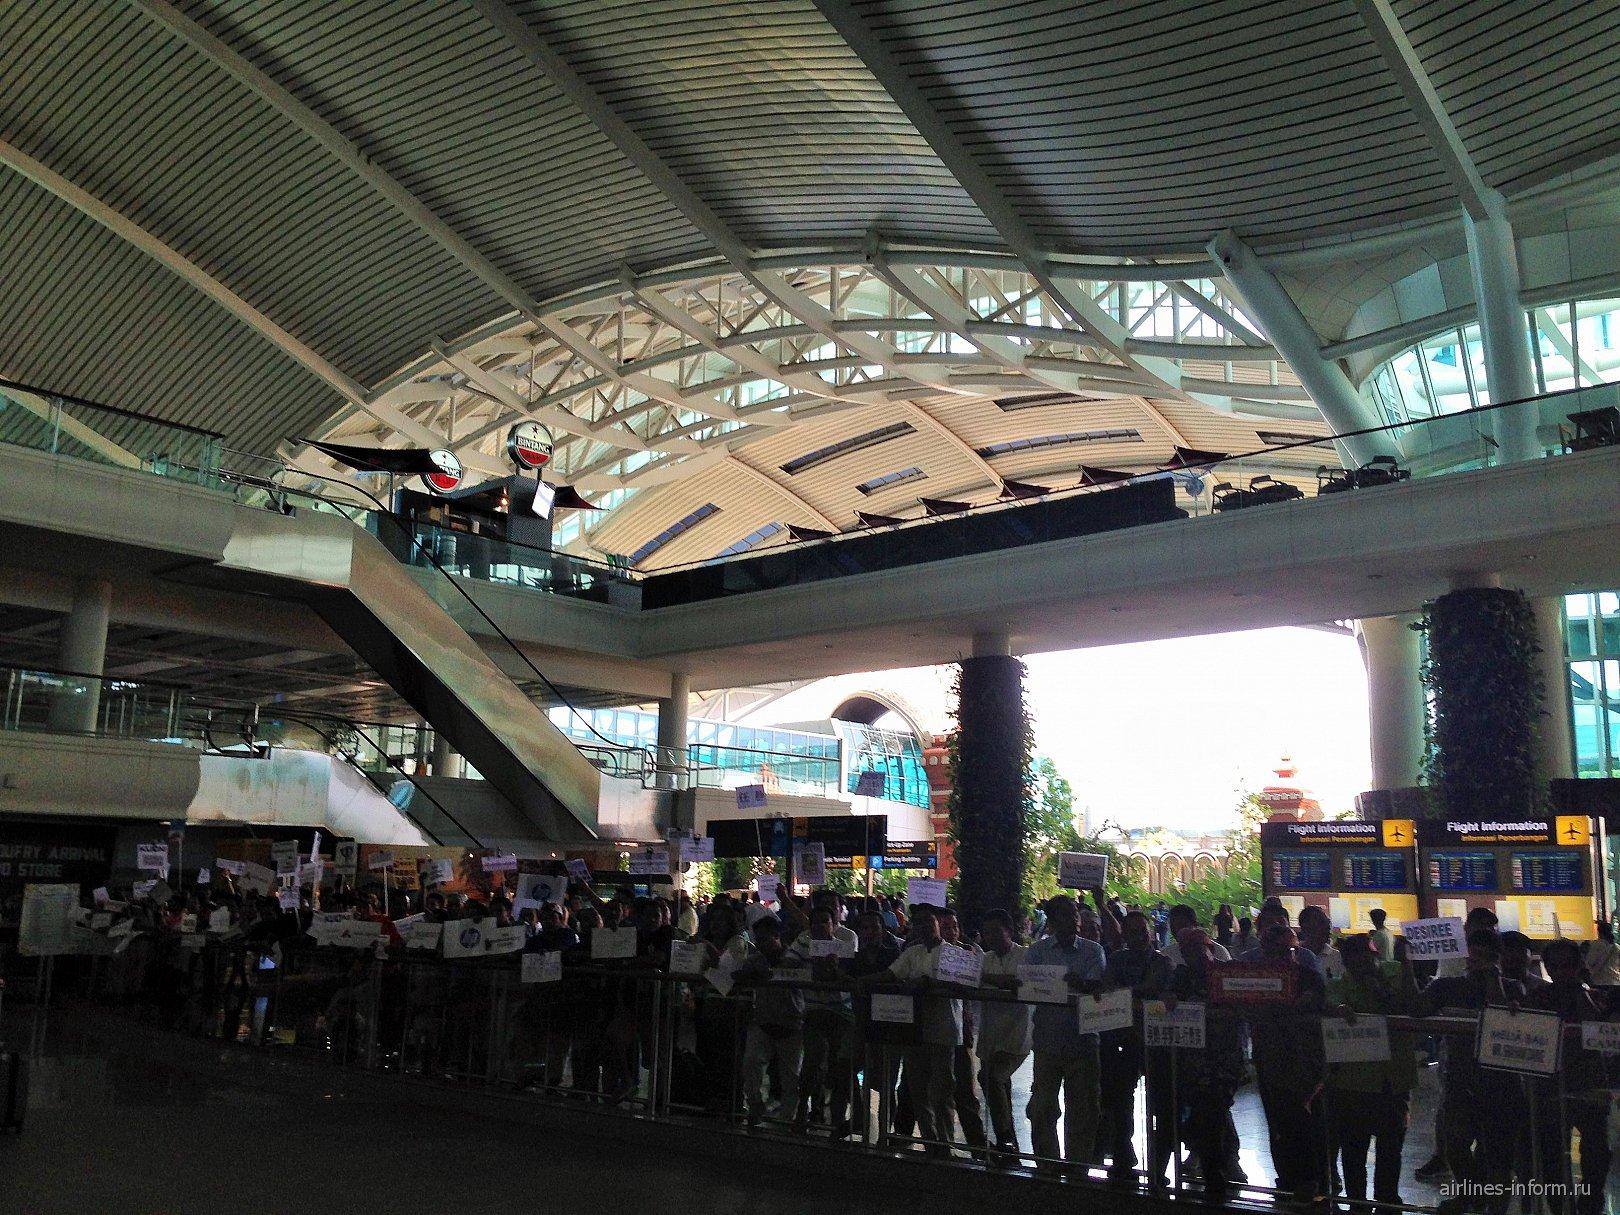 Выход из аэропорта Денпасар Нгура Рай